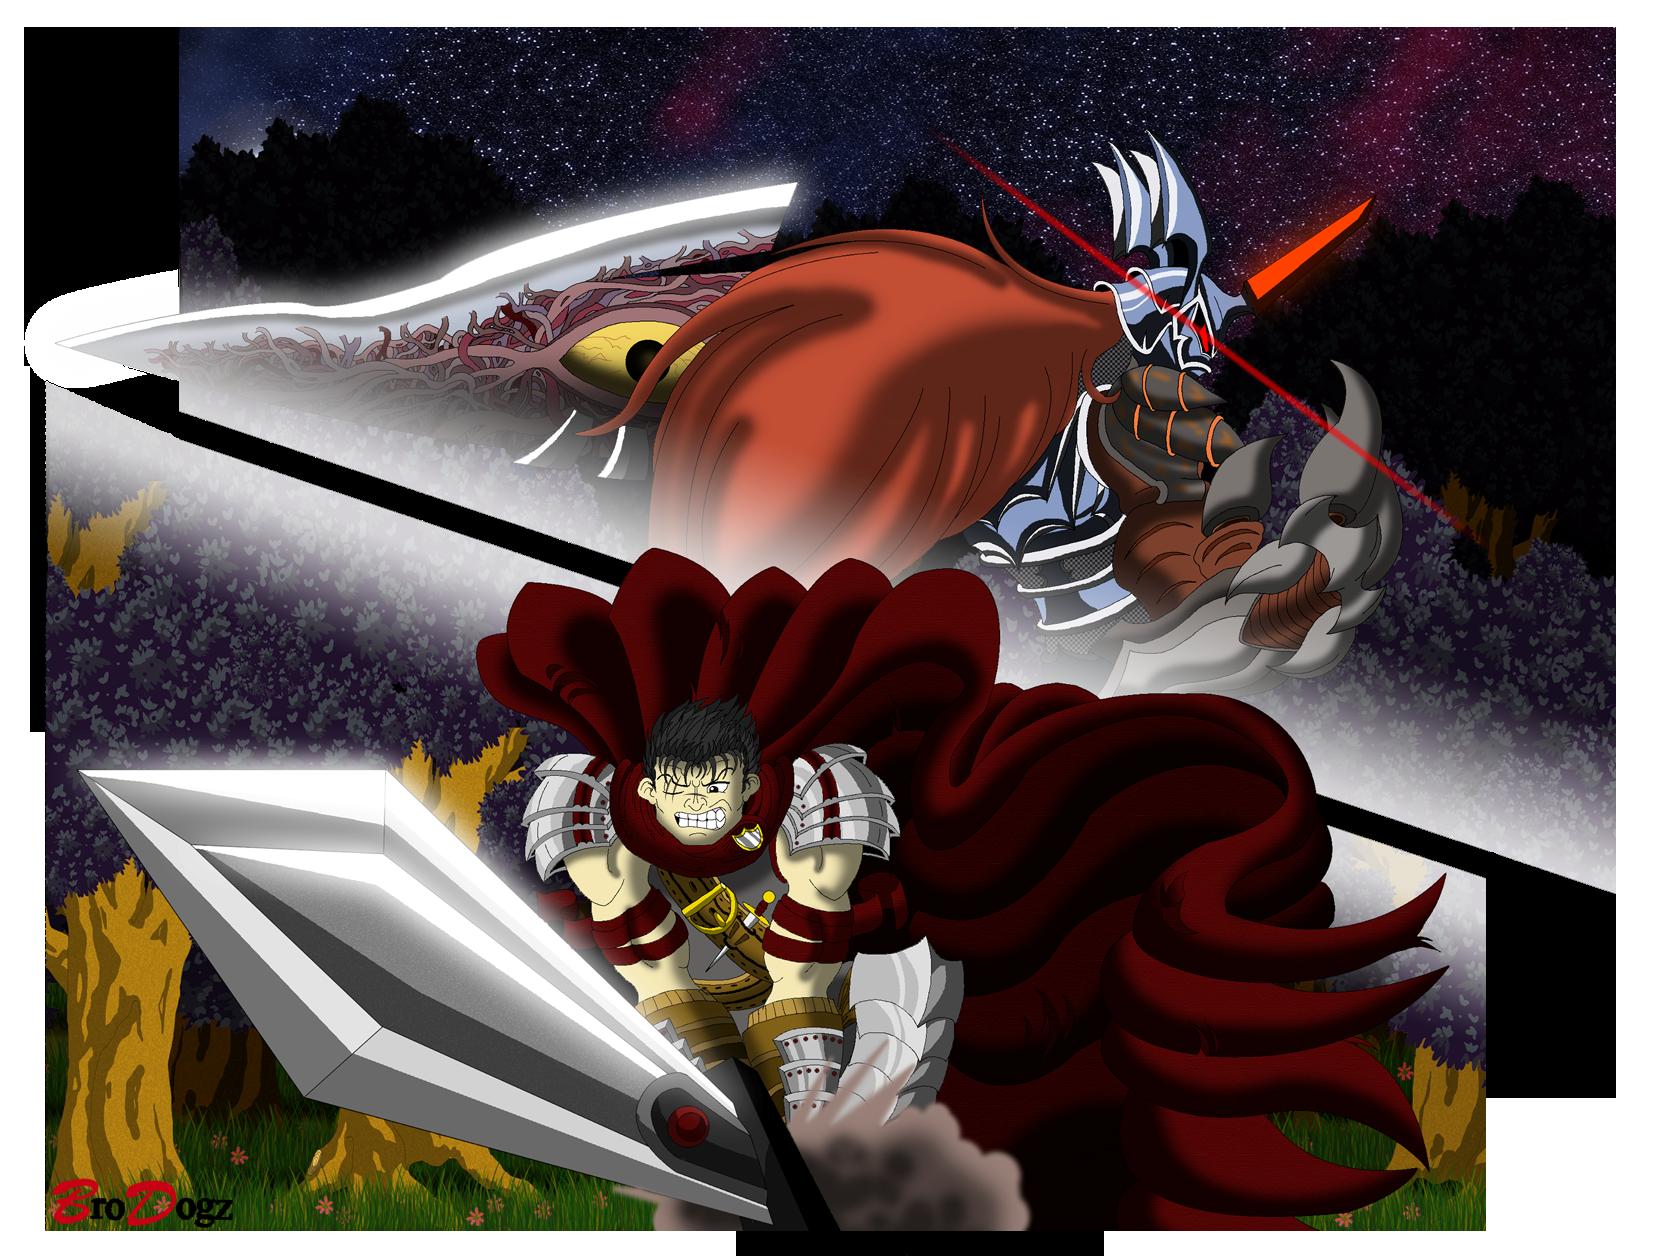 Comm: Nightmare vs Gutz - Final Blow by BroDogz